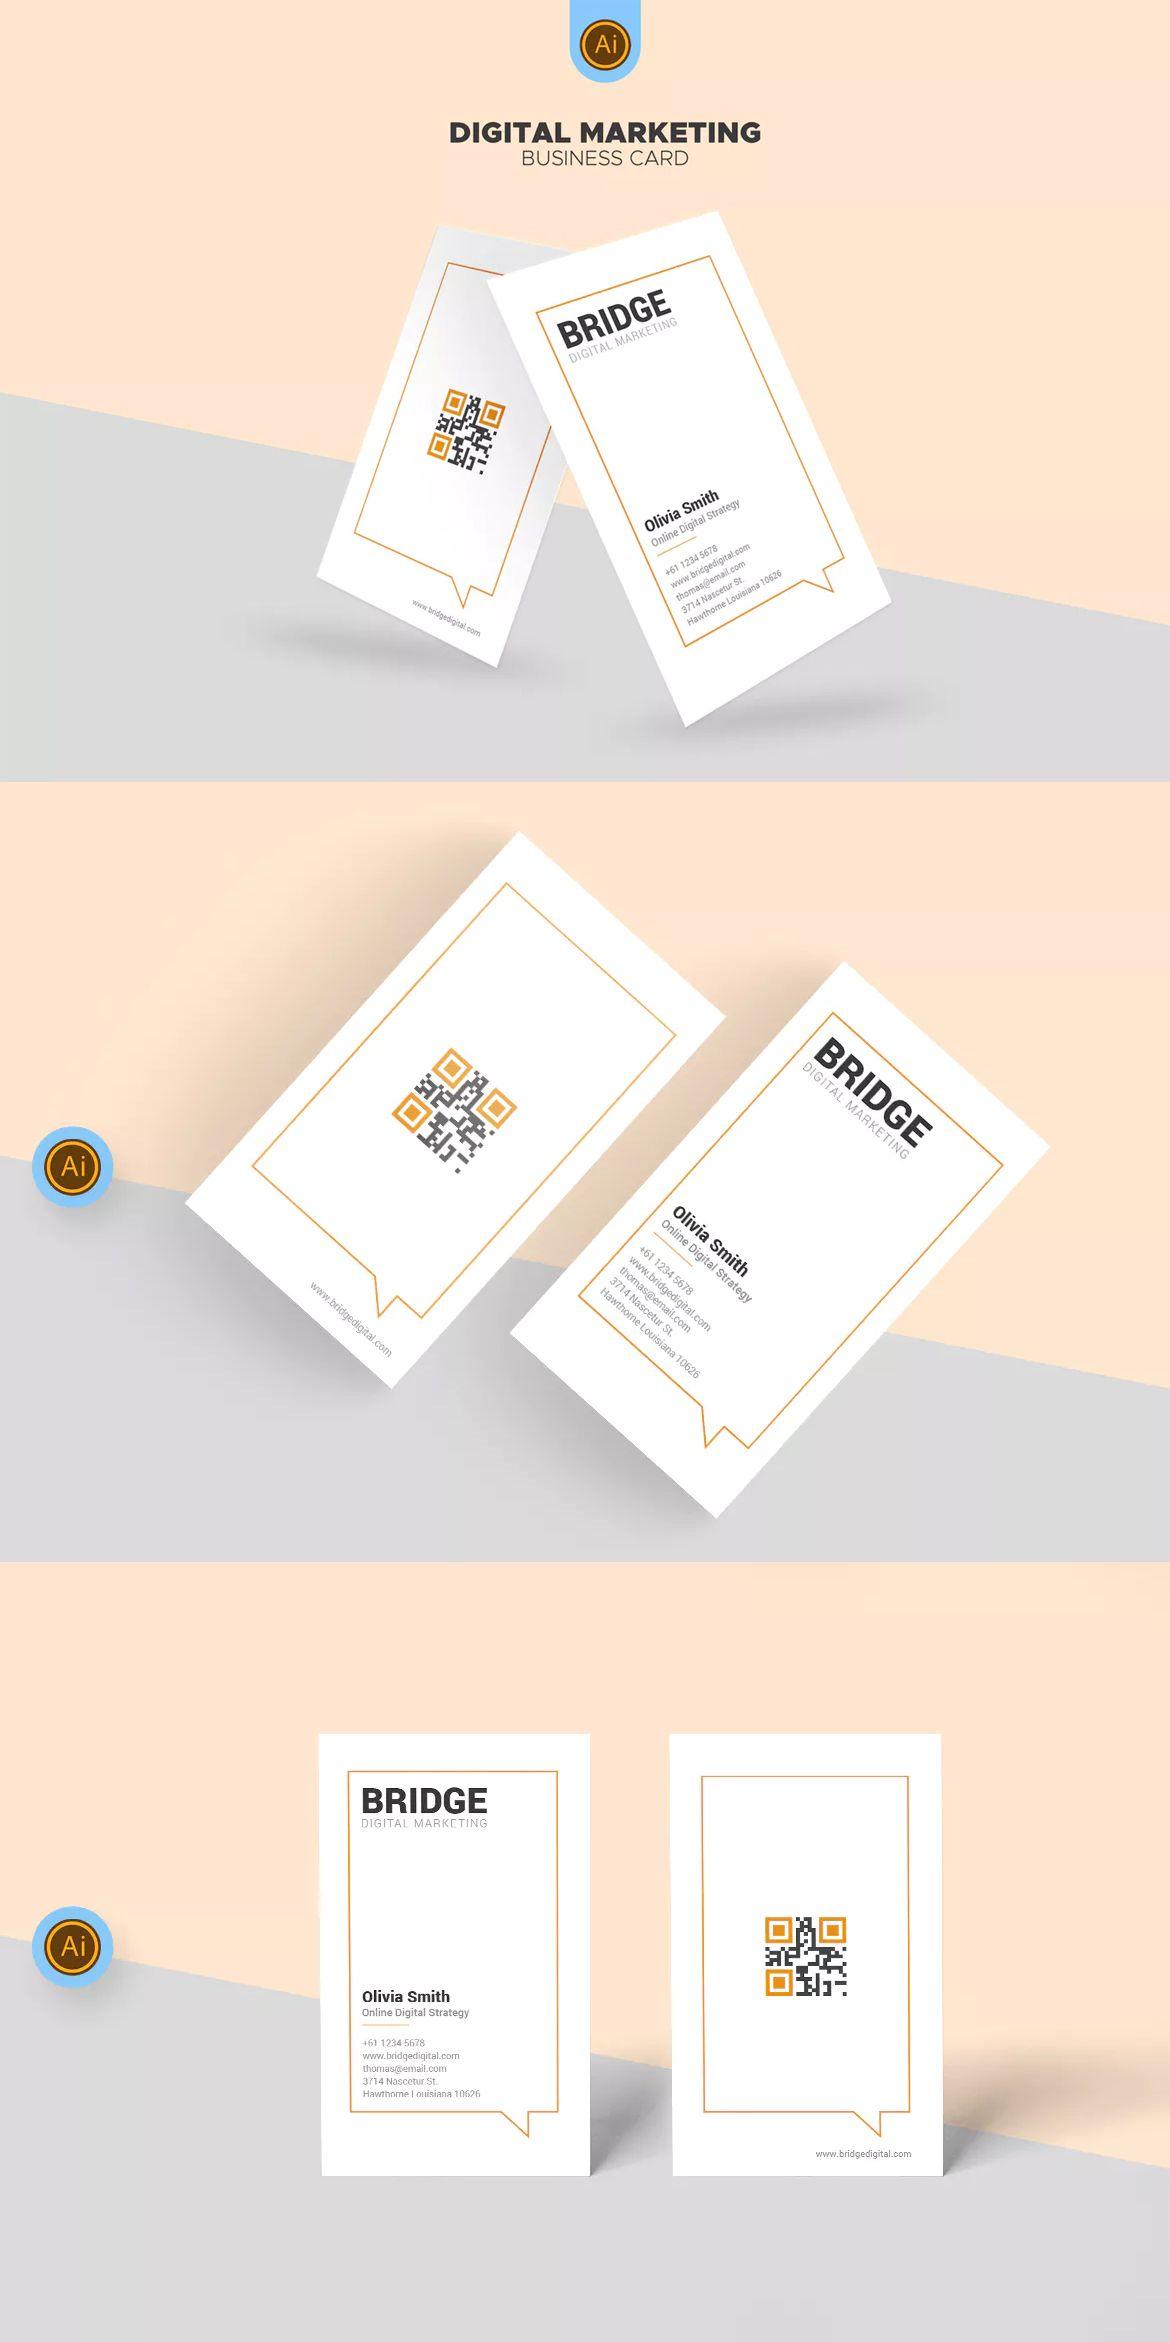 bridge digital marketing business card template ai